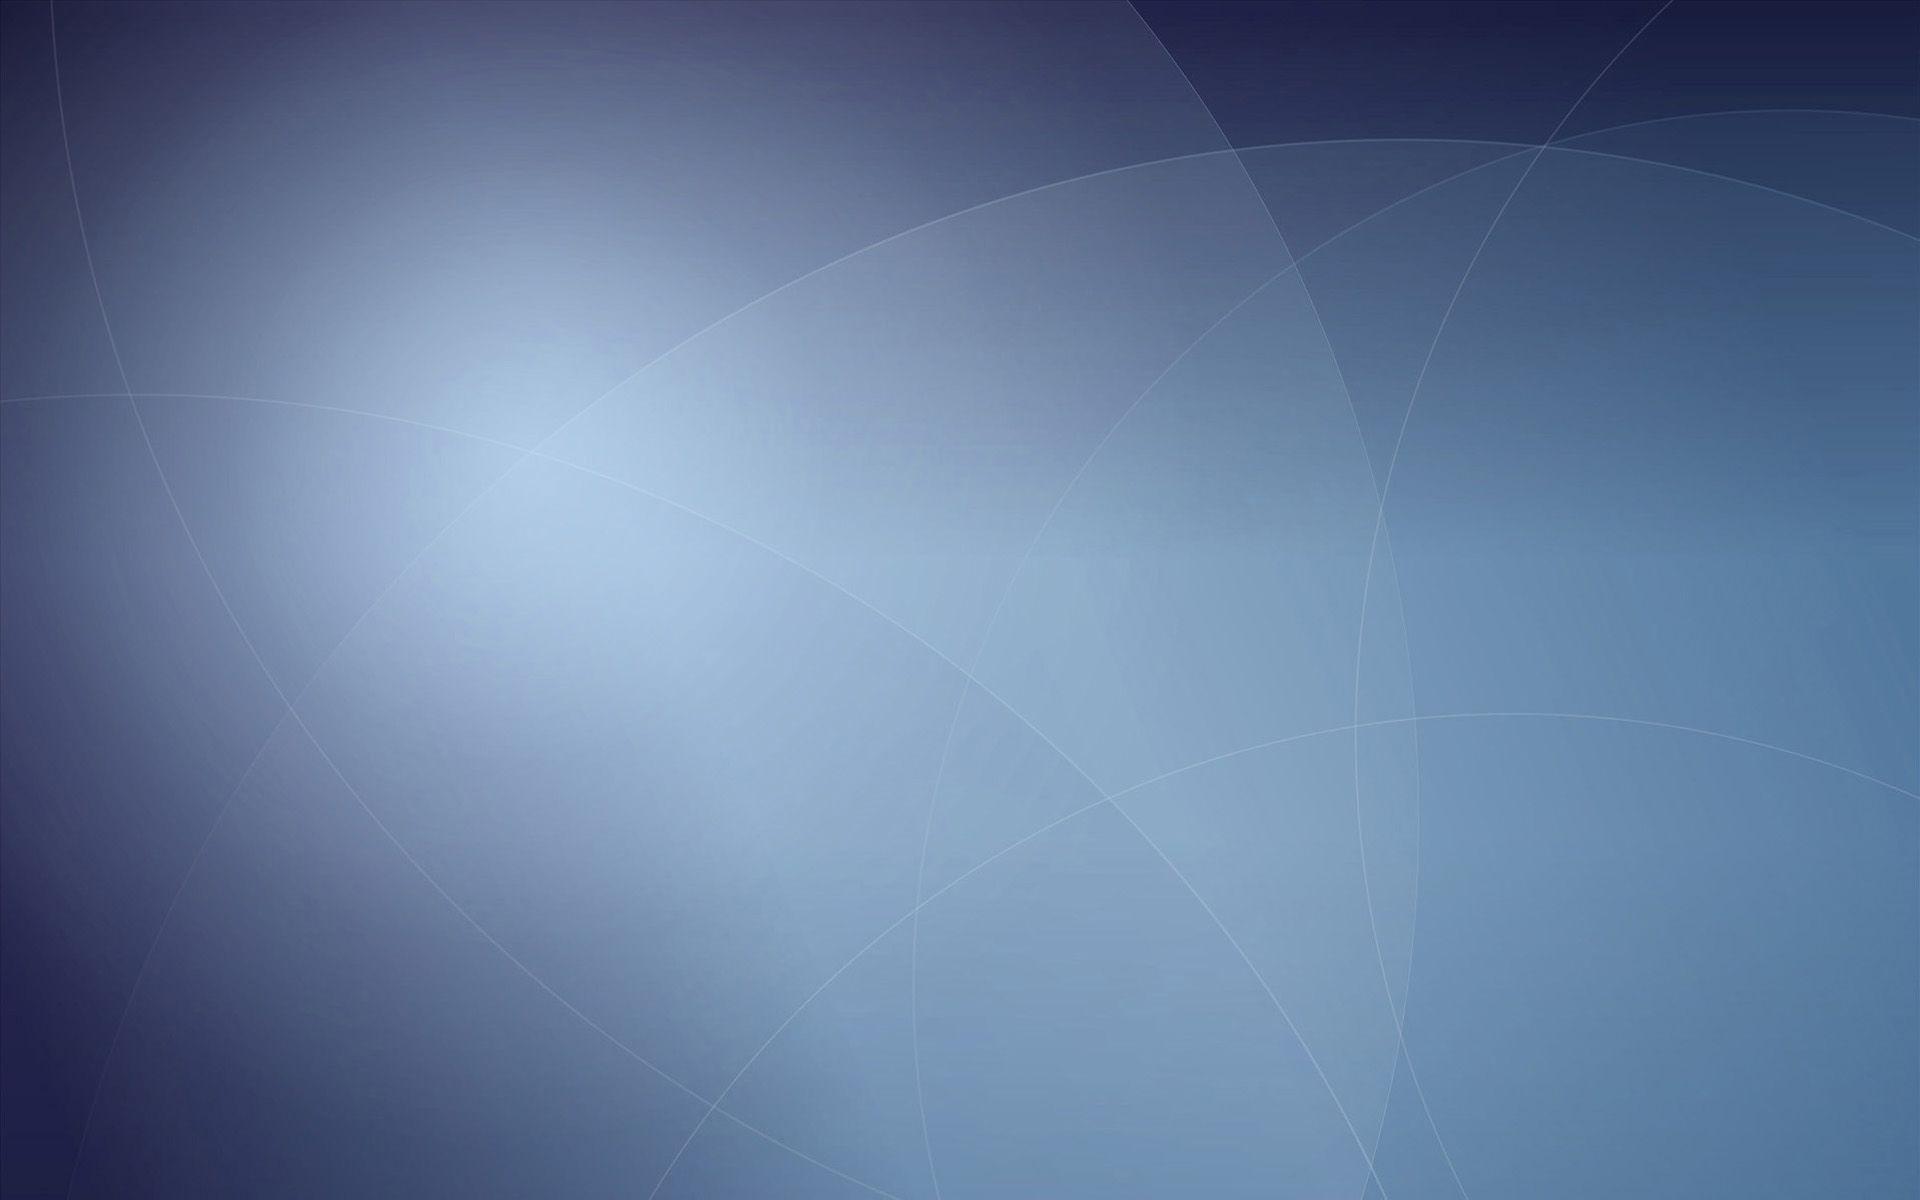 Ubuntu Blue Wallpapers 1920x1200